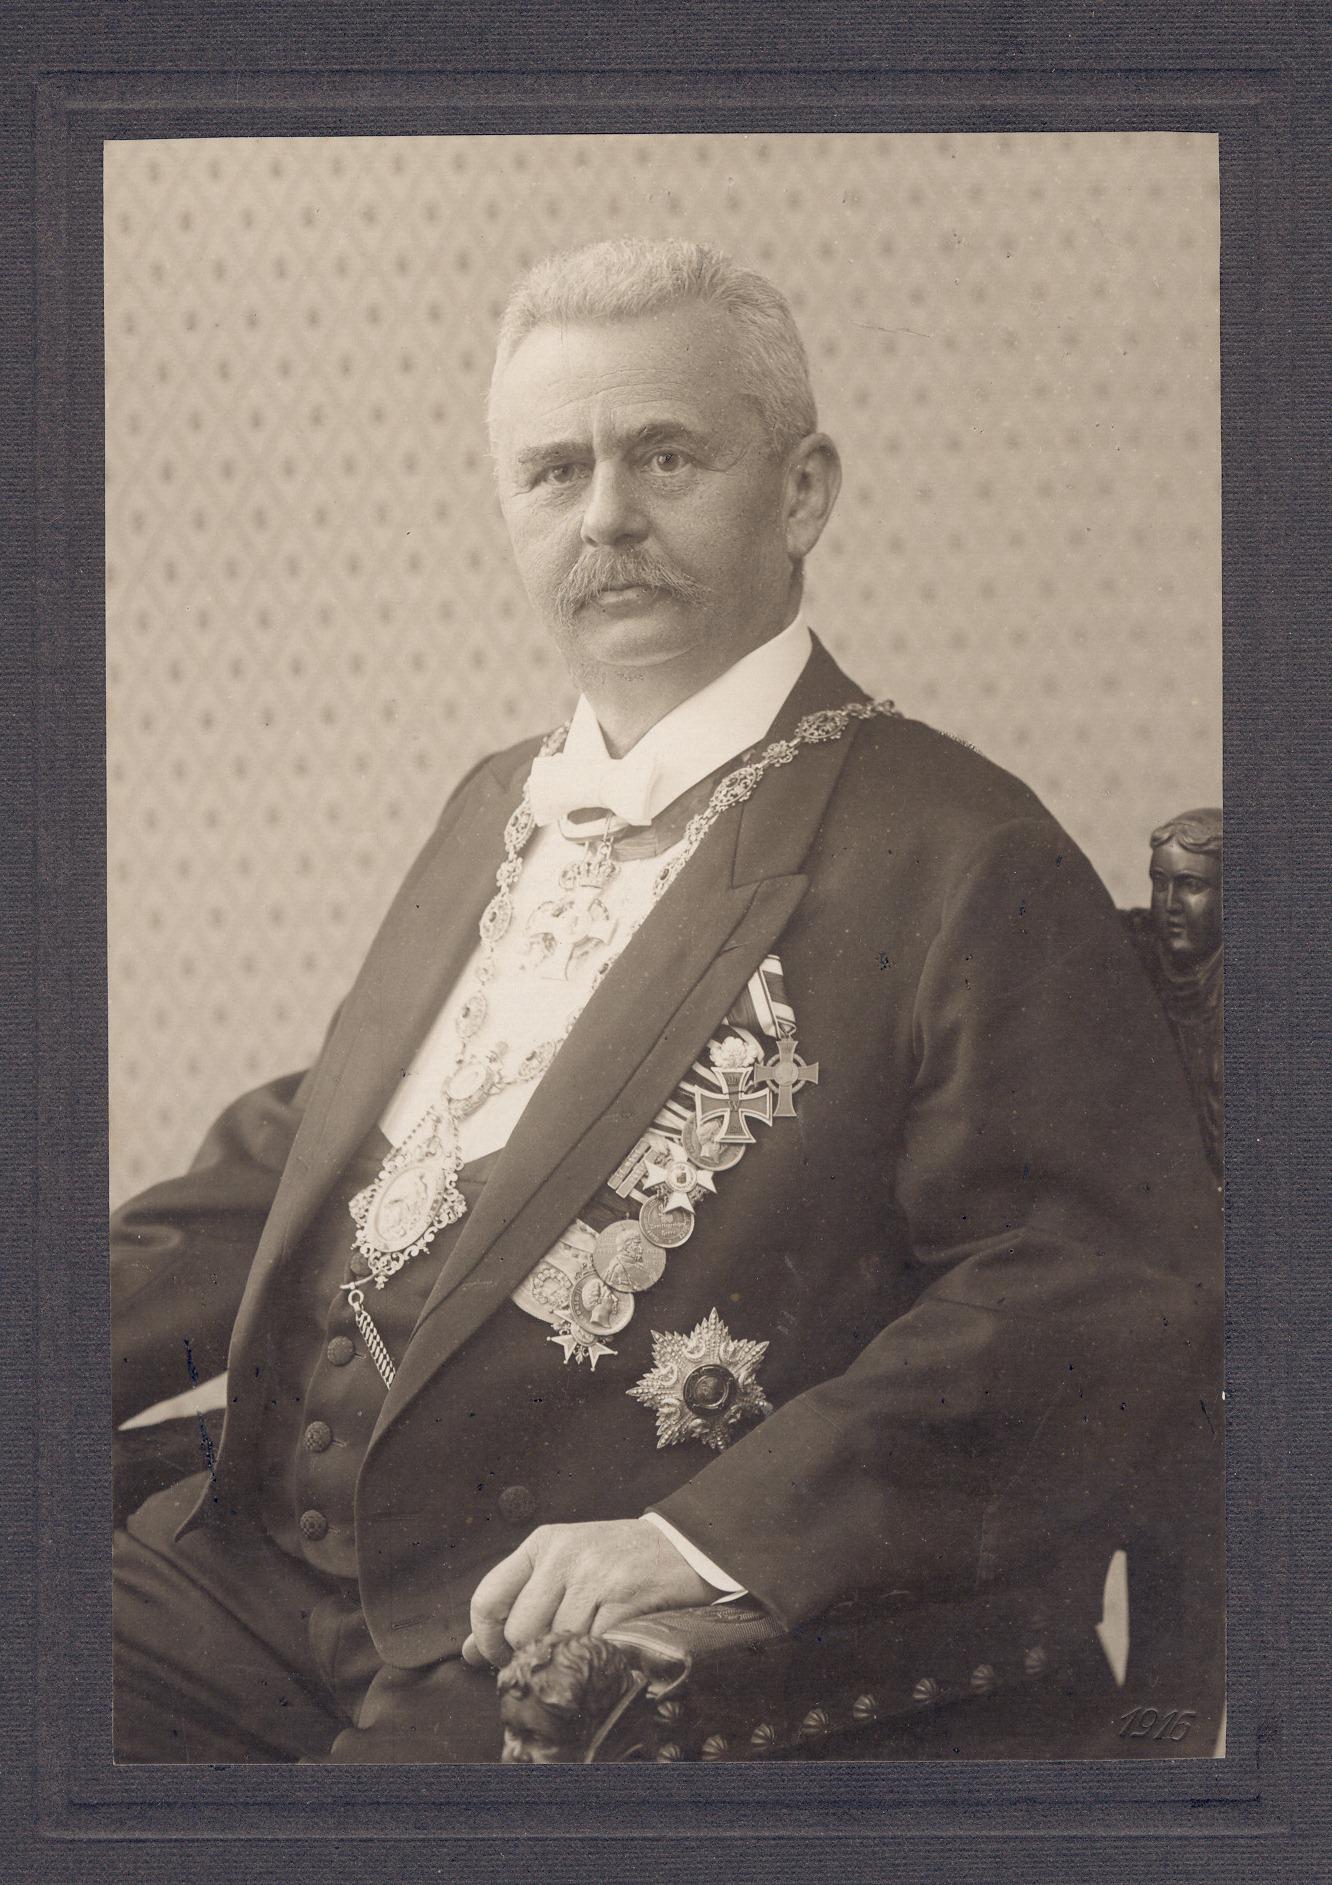 Cornelius Gustav Gurlitt